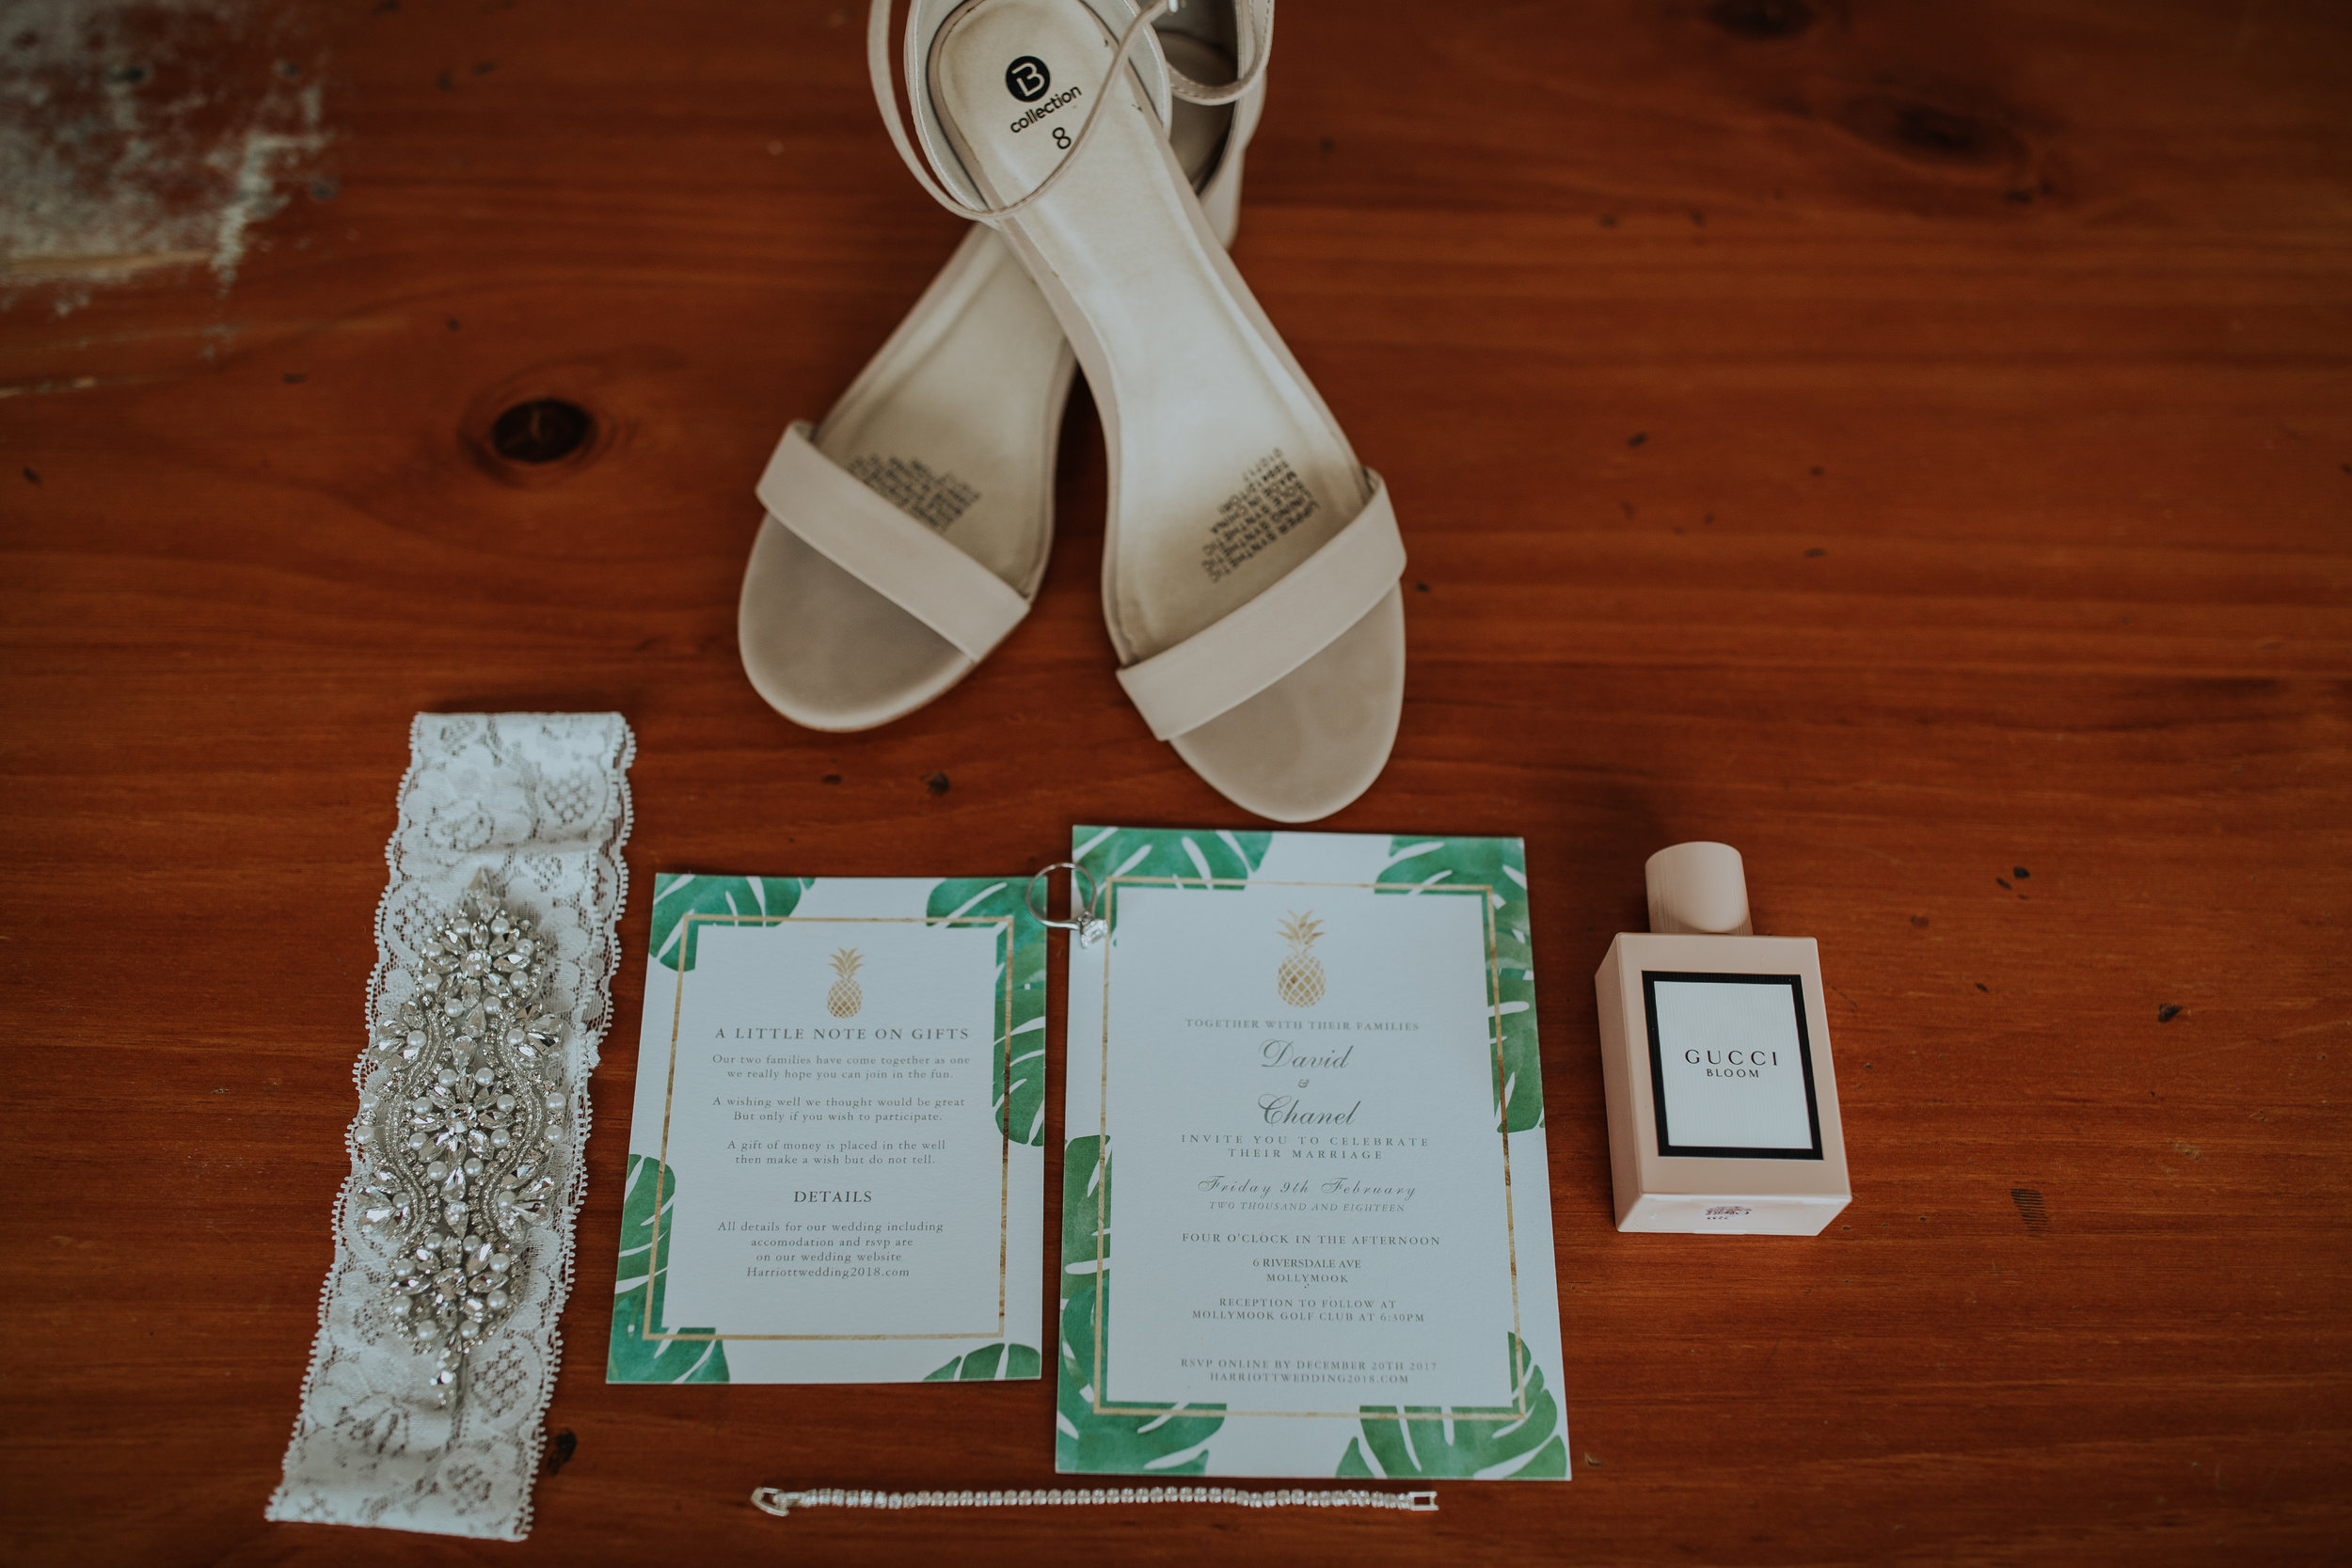 Chanel + David Wedding-208.jpg